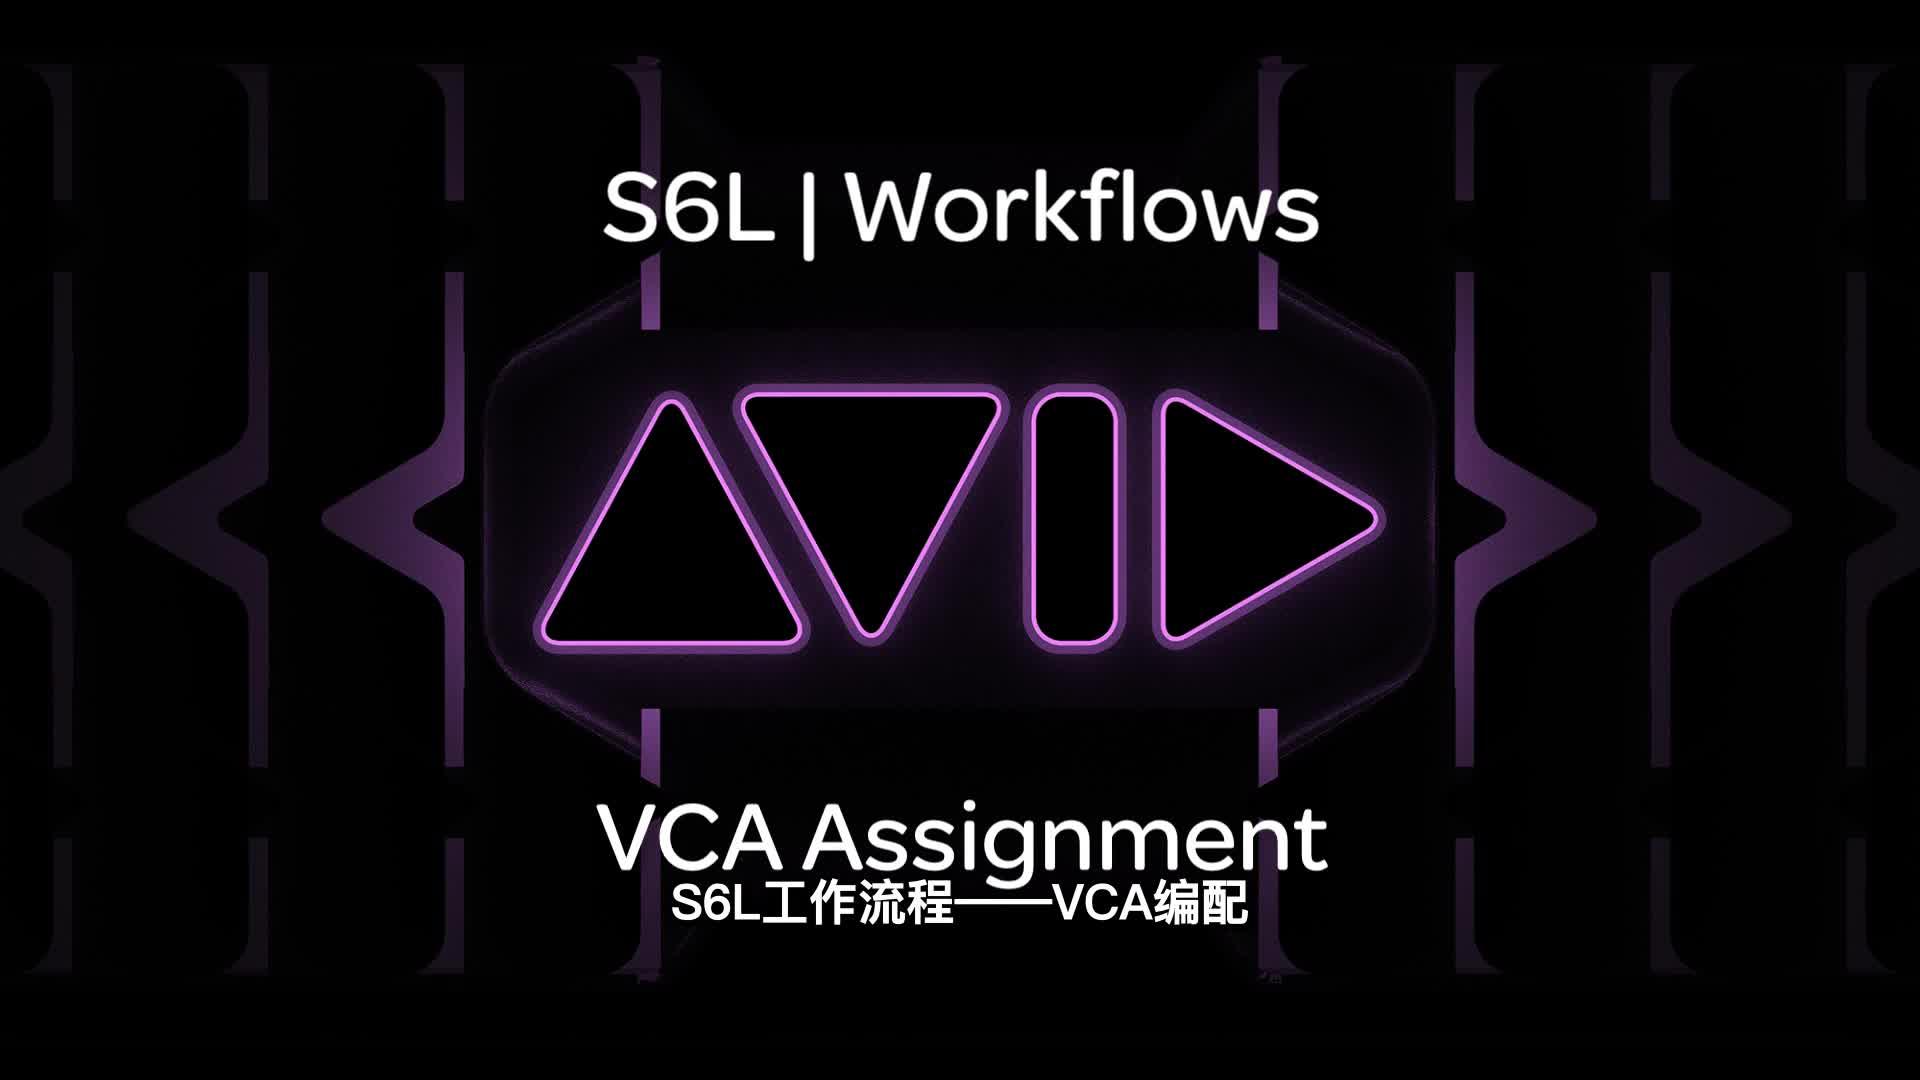 07 VENUE  S6L|Workflows VCA Assignment